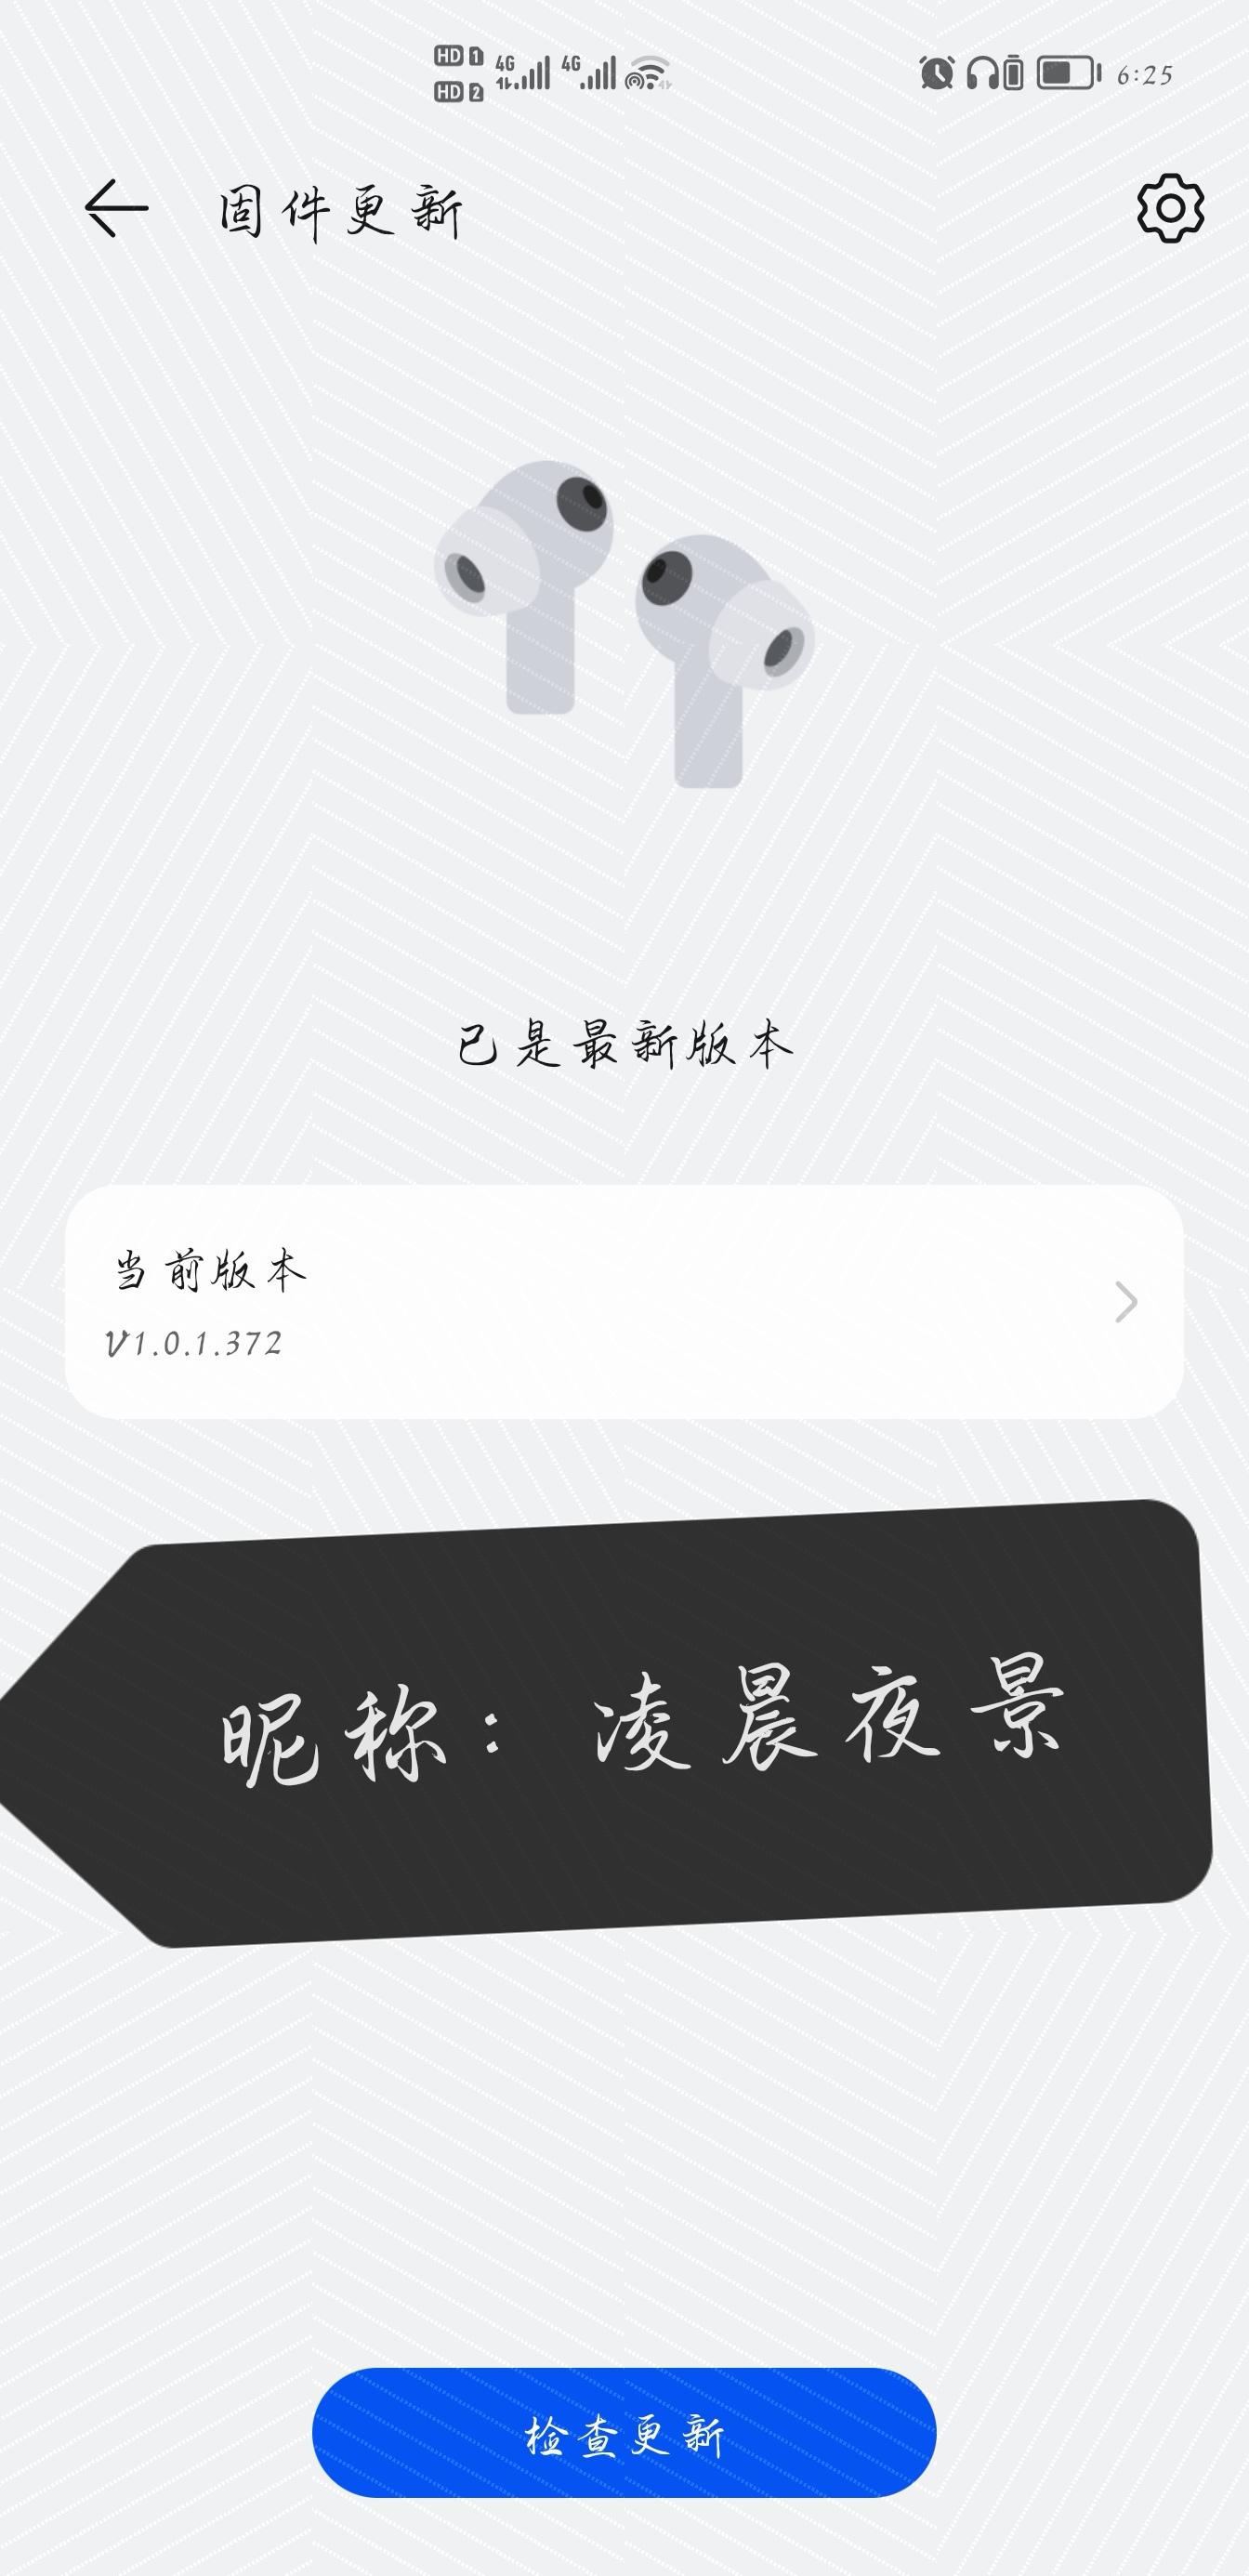 Screenshot_20210520_182509_com.huawei.smarthome_edit_29672063116305.jpg